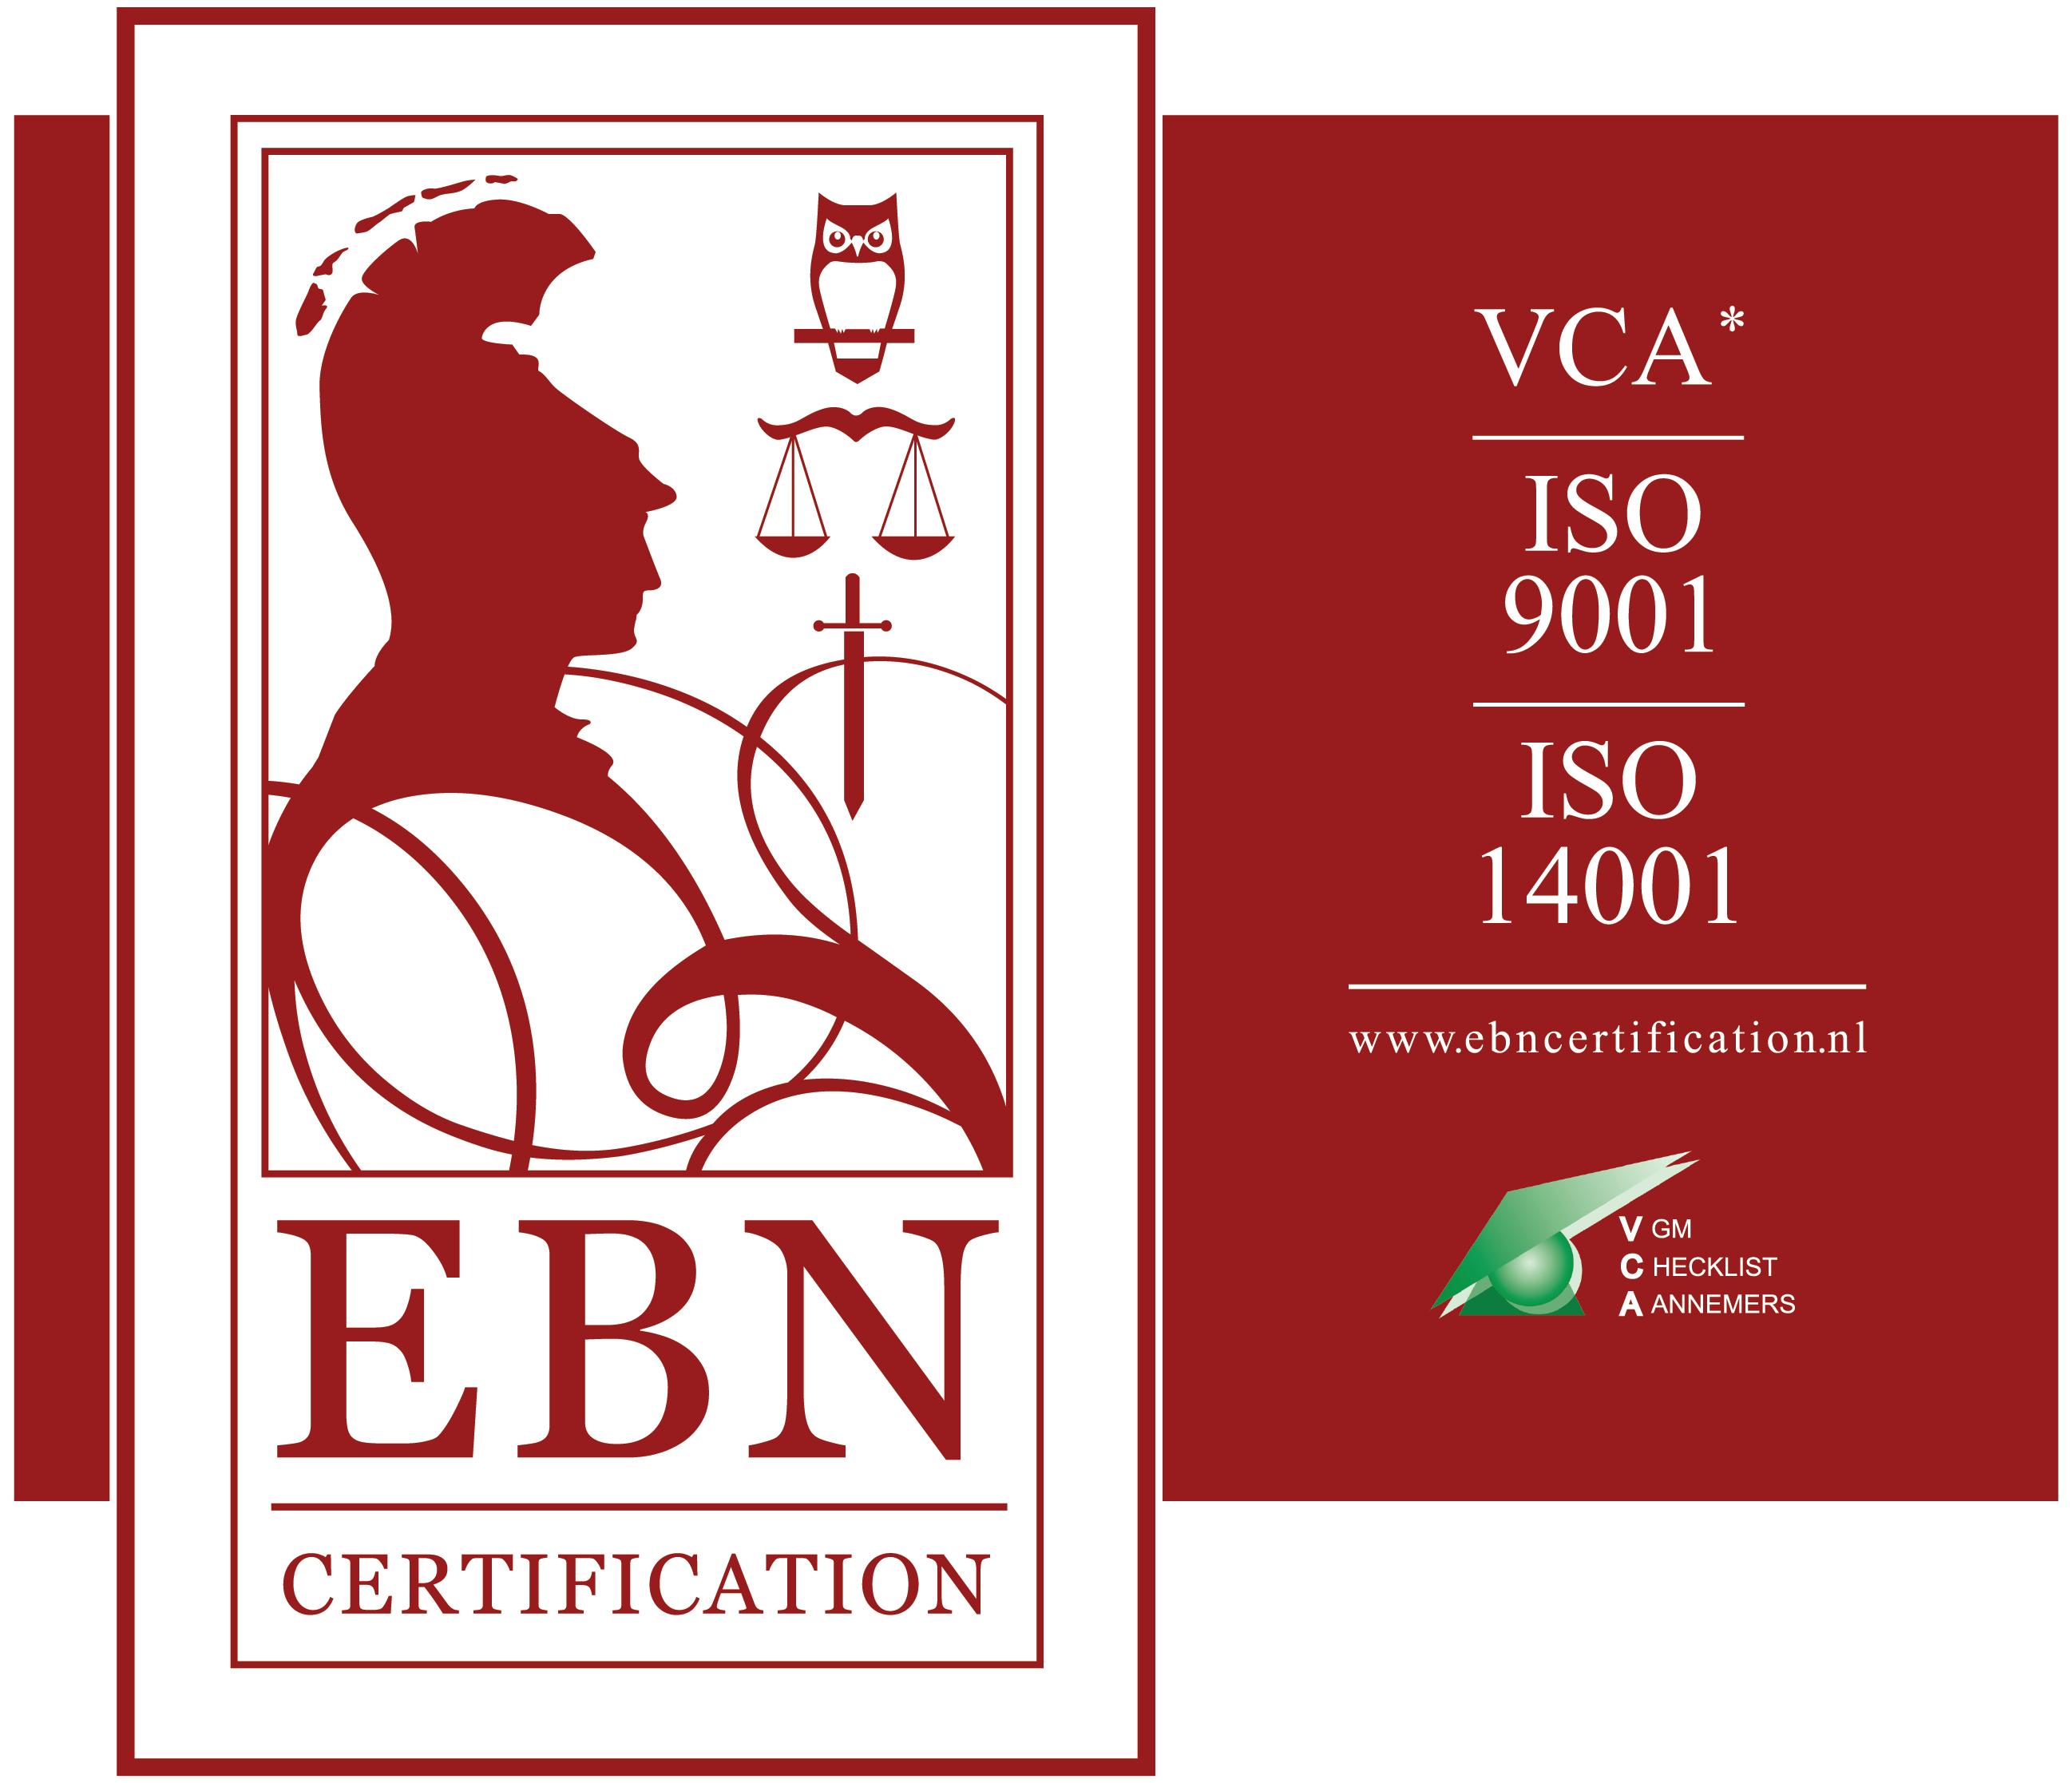 VCA1sterISO9001ISO14001 website logo-29